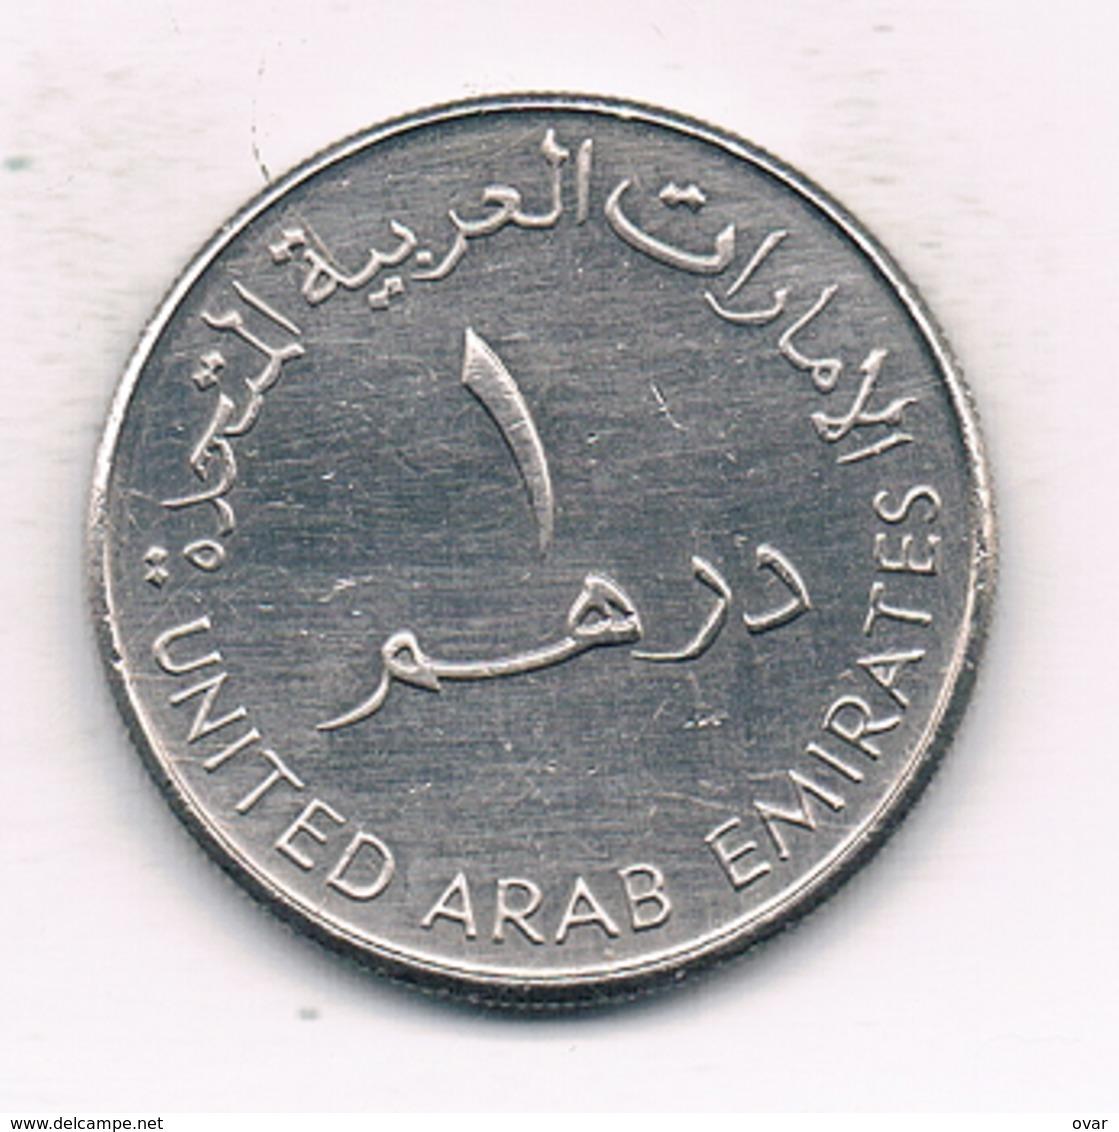 1 FILS 1998  U.A.E /274/ - Emirats Arabes Unis